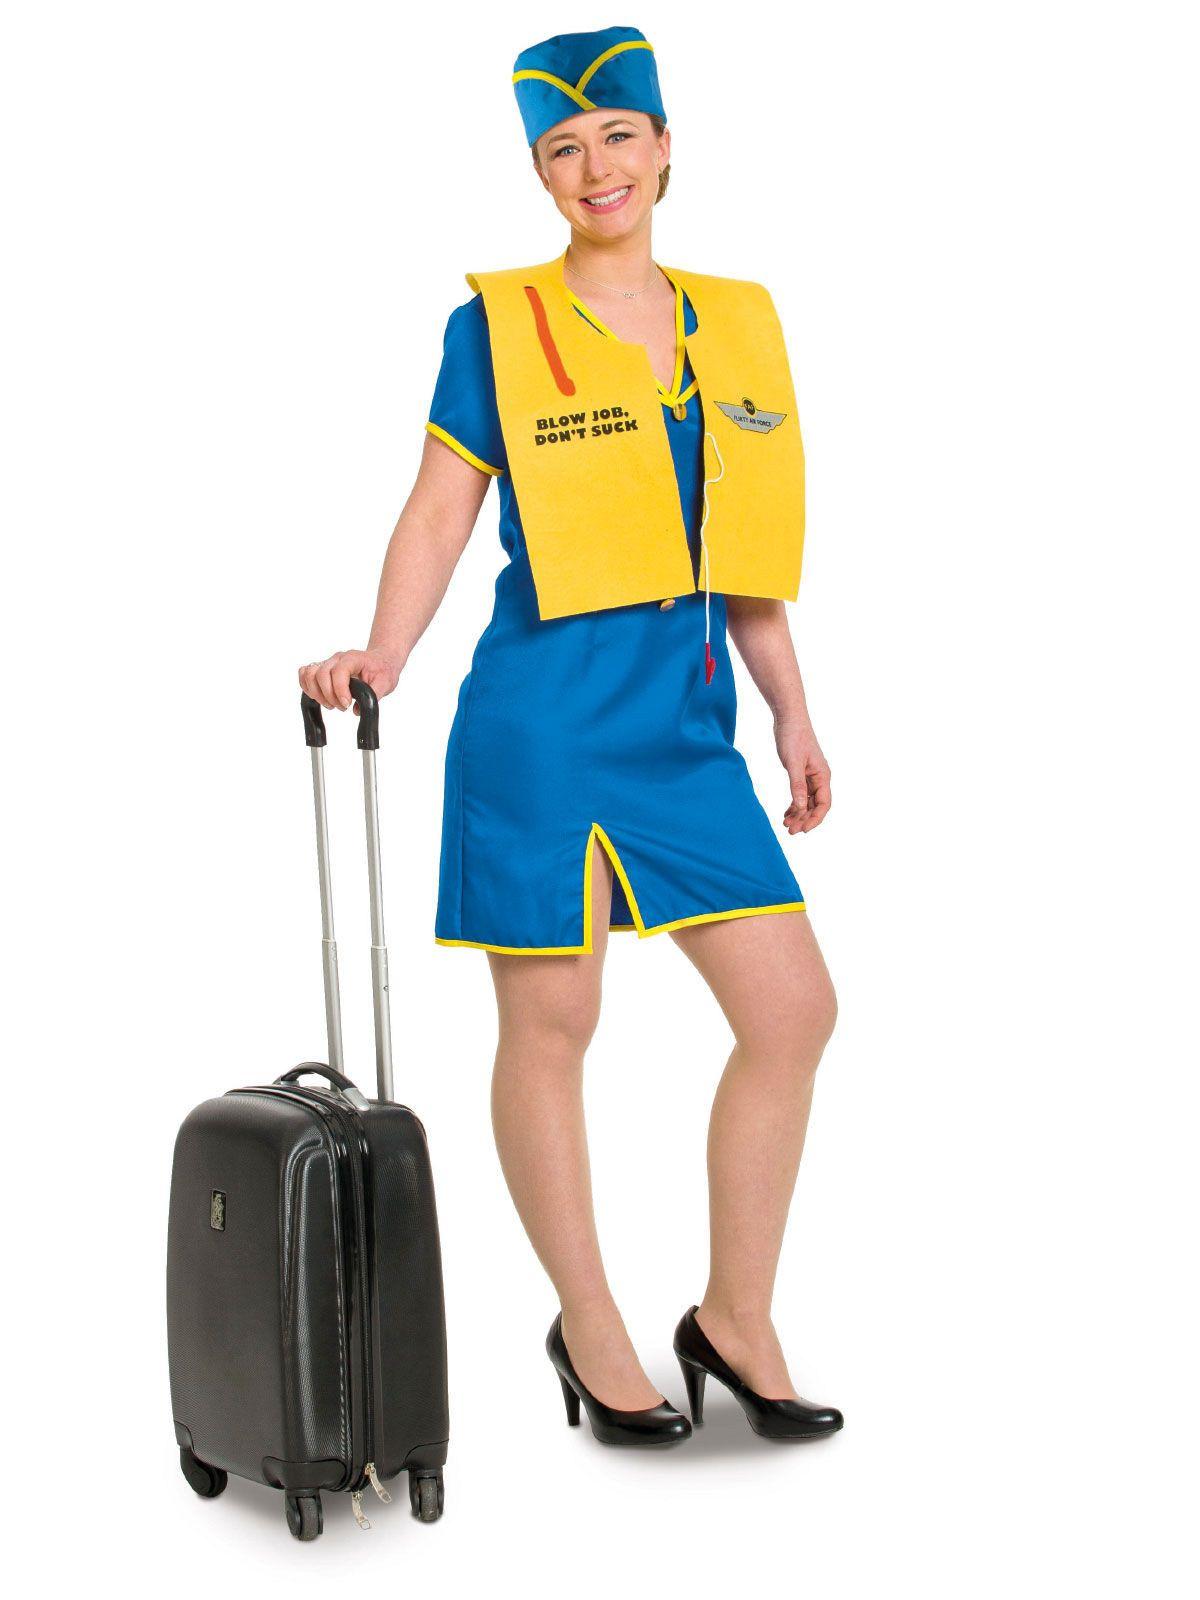 3f59caaa86409 Stewardess Damenkostüm Flugbegleiterin blau-gelb , günstige ...